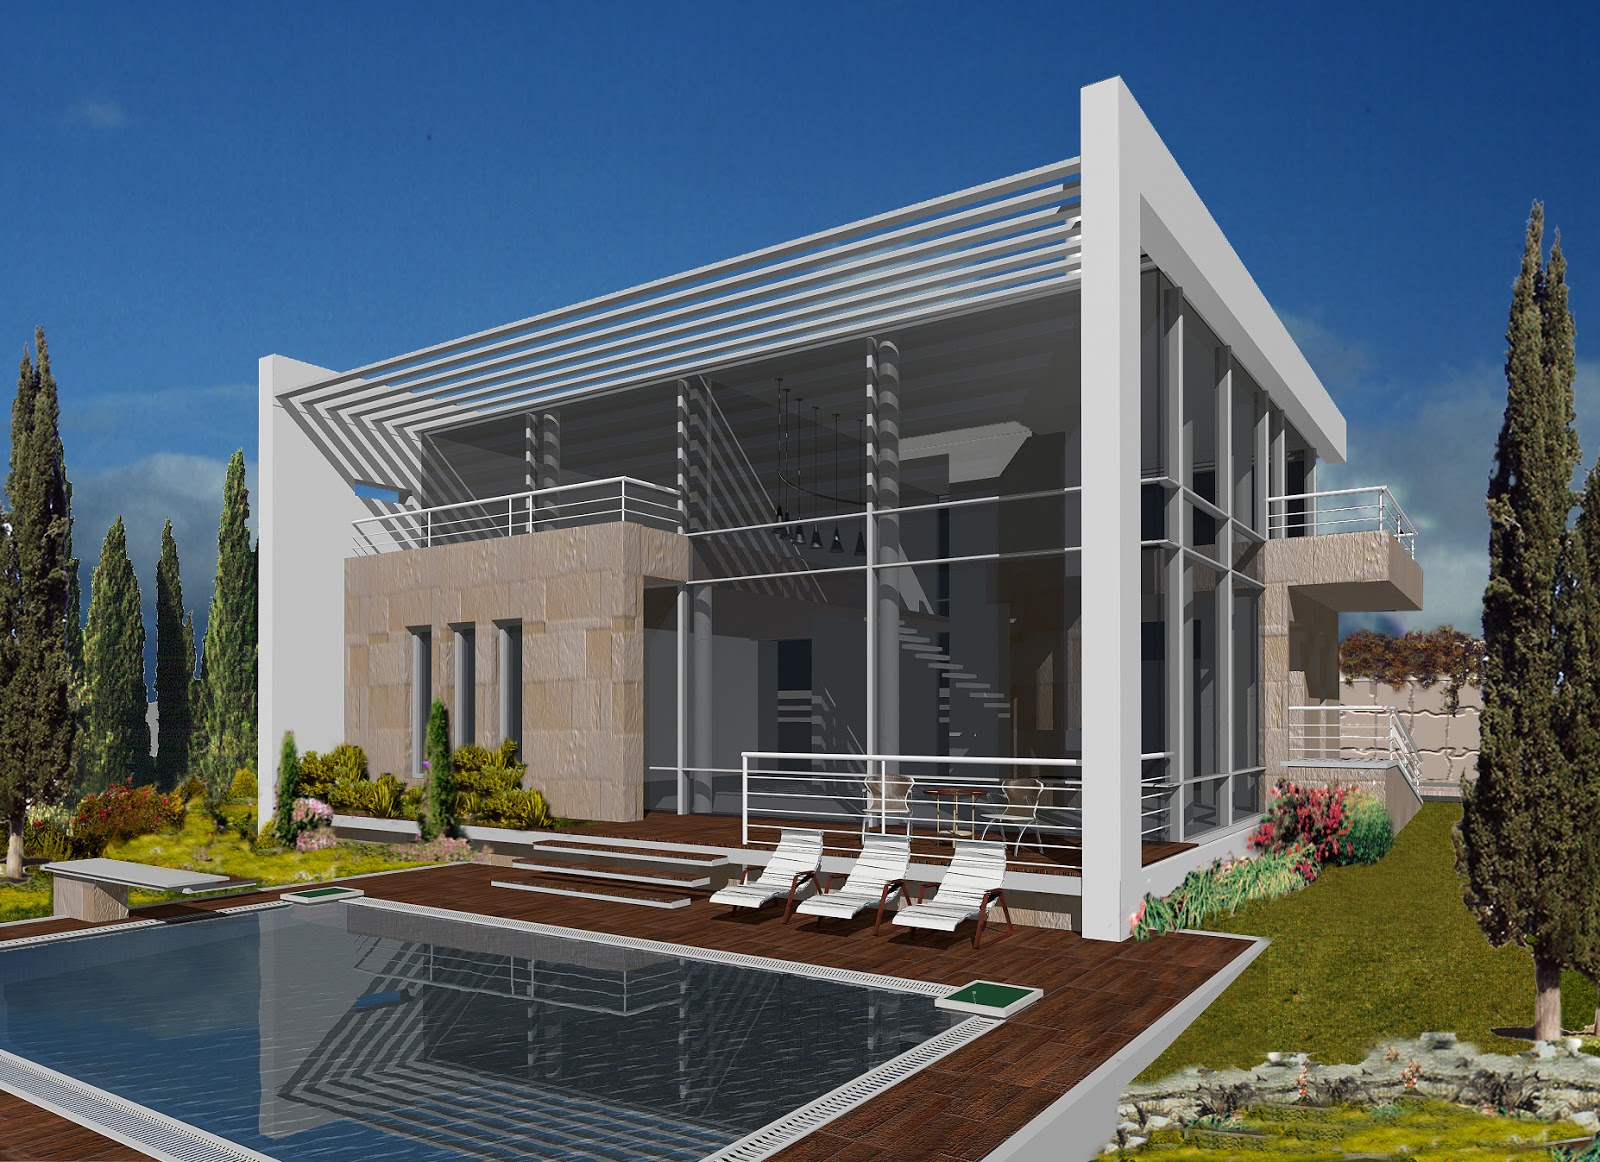 New home designs latest. Beautiful modern homes latest mediterranean homes exterior designs.